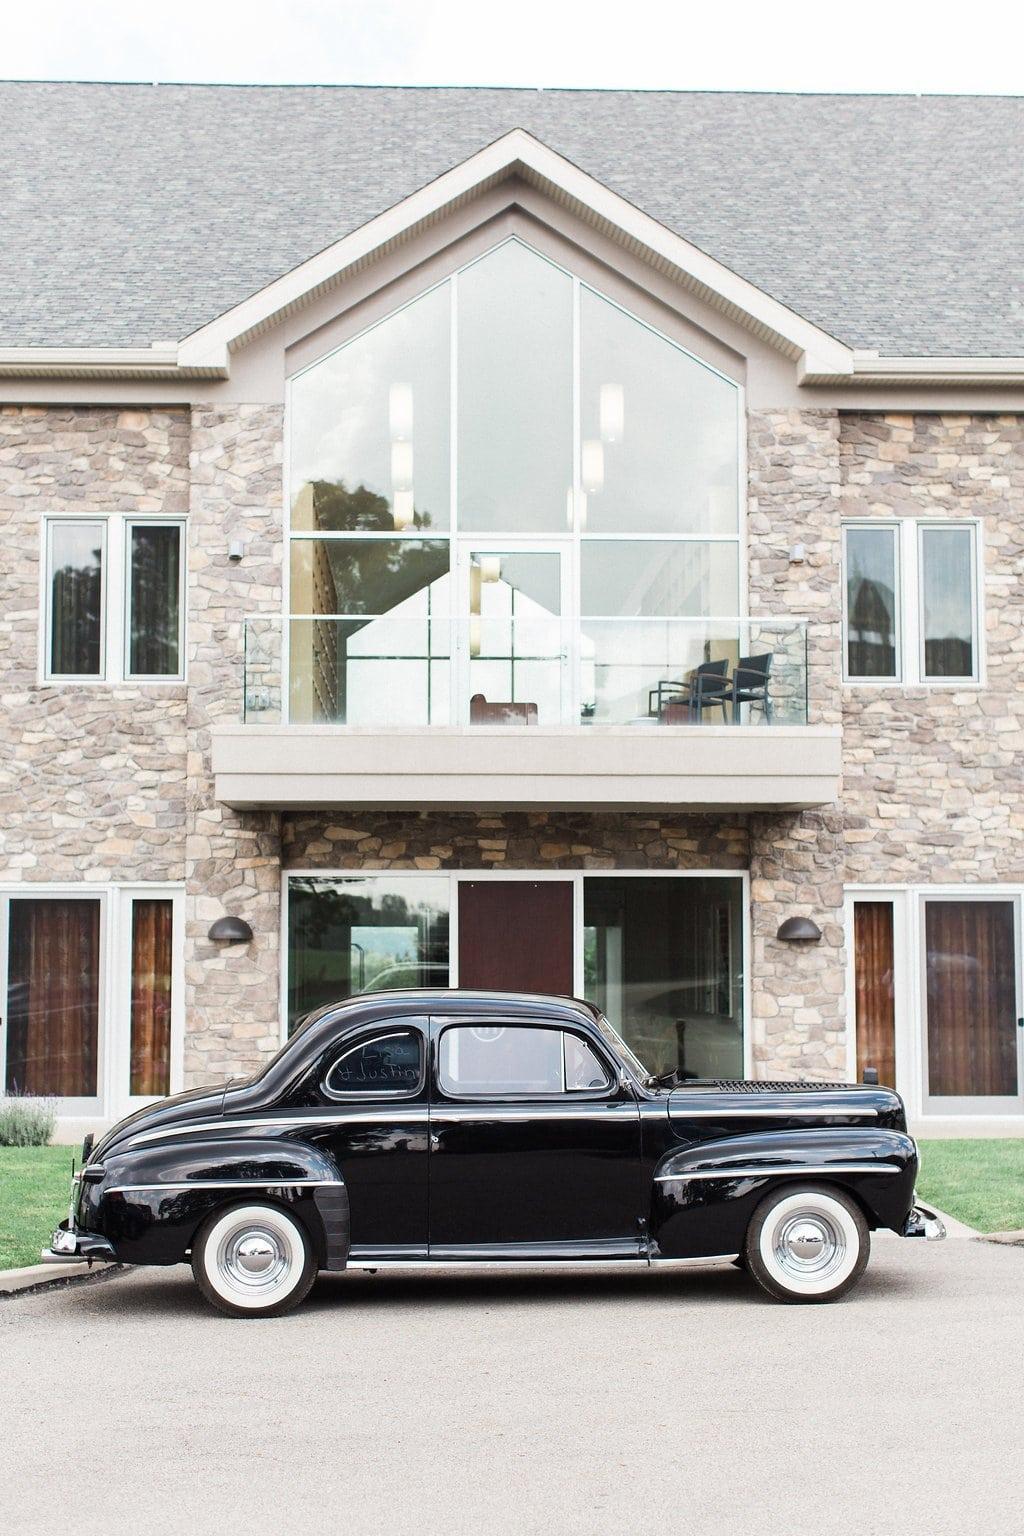 Vintage black car